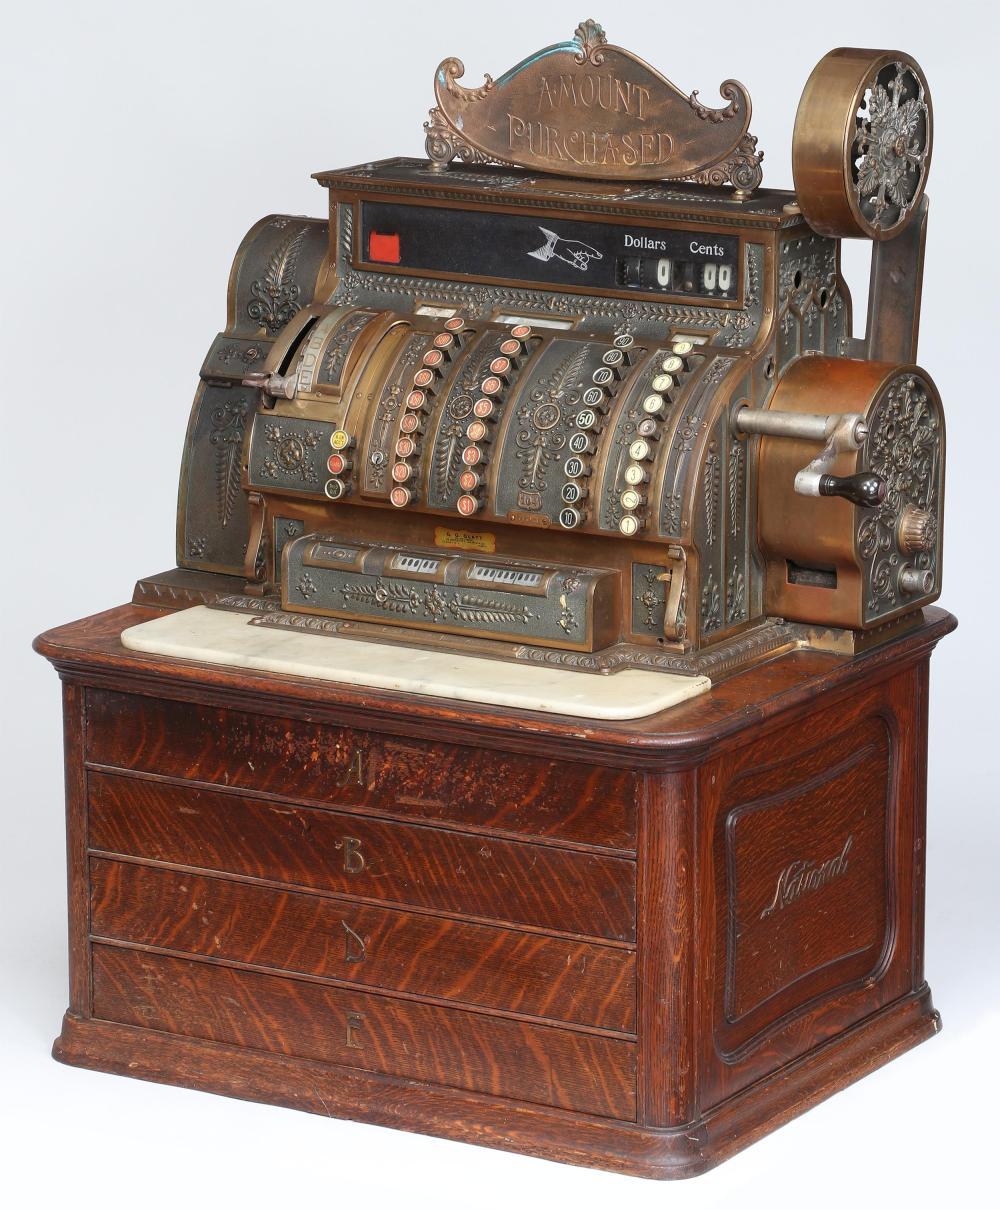 National Cash Register, model #104